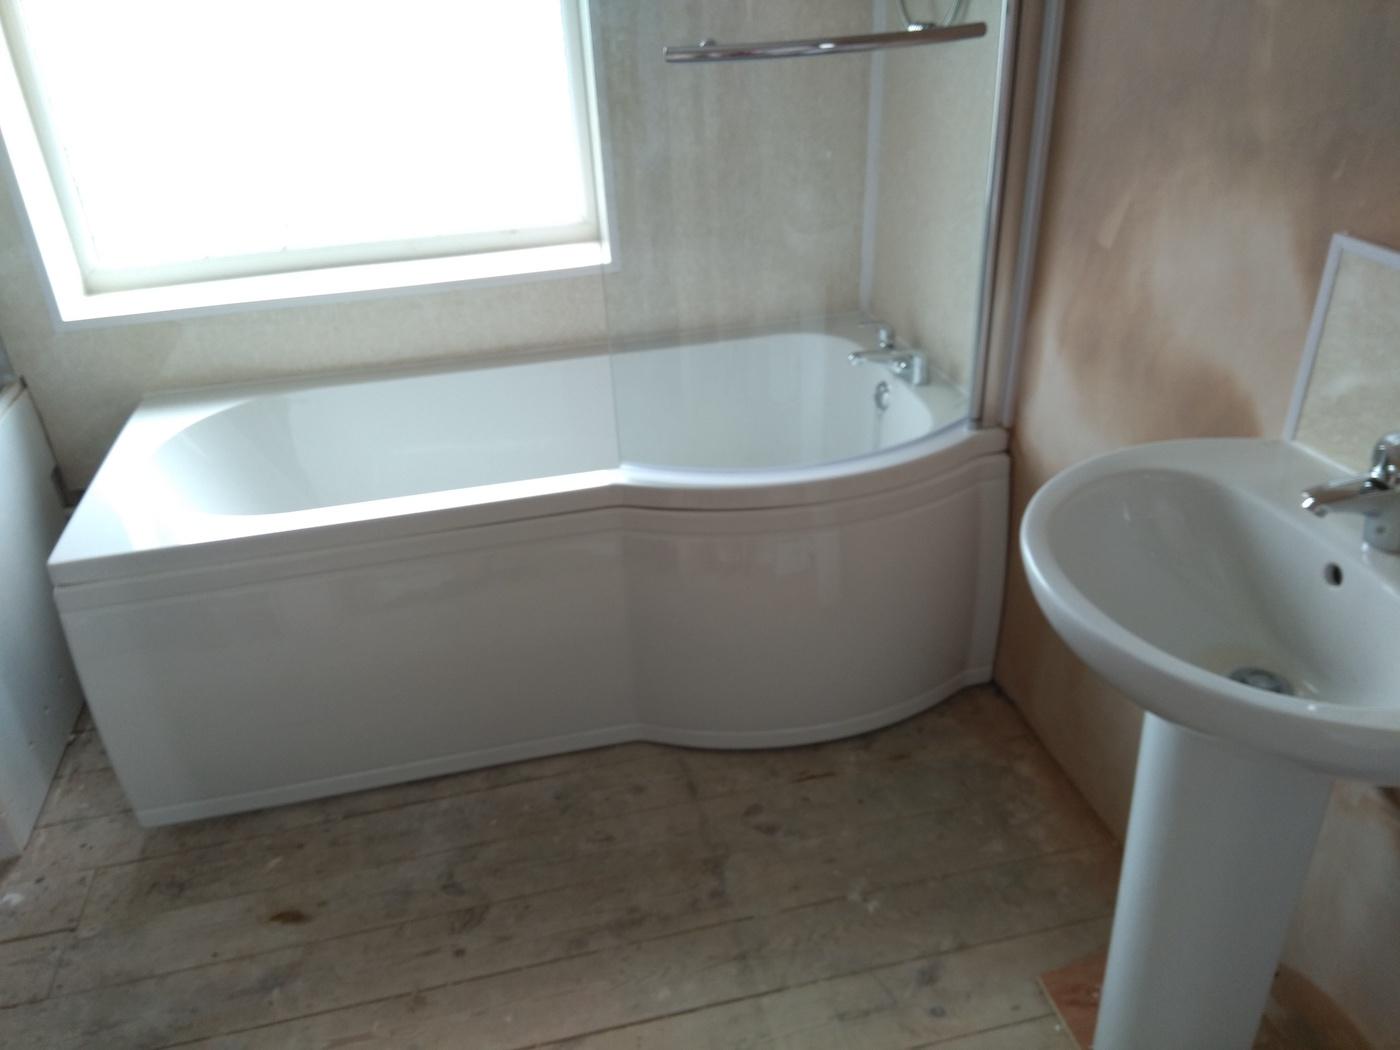 New-Bathroom-in-Leeholme-DL14-8HE